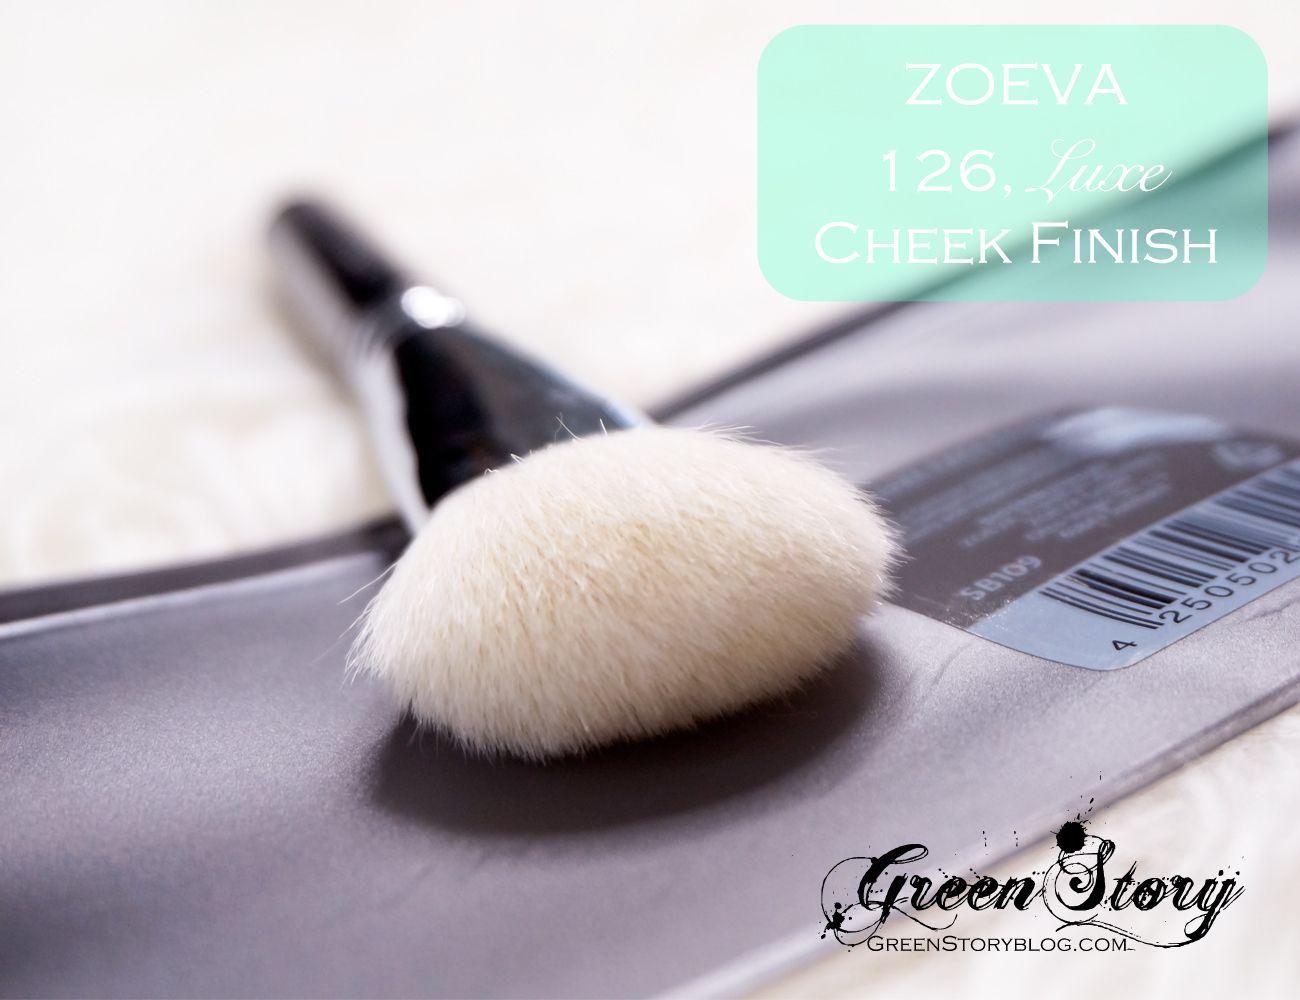 ZoevaCosmetics Face Brushes 126 Luxe Cheek Finish